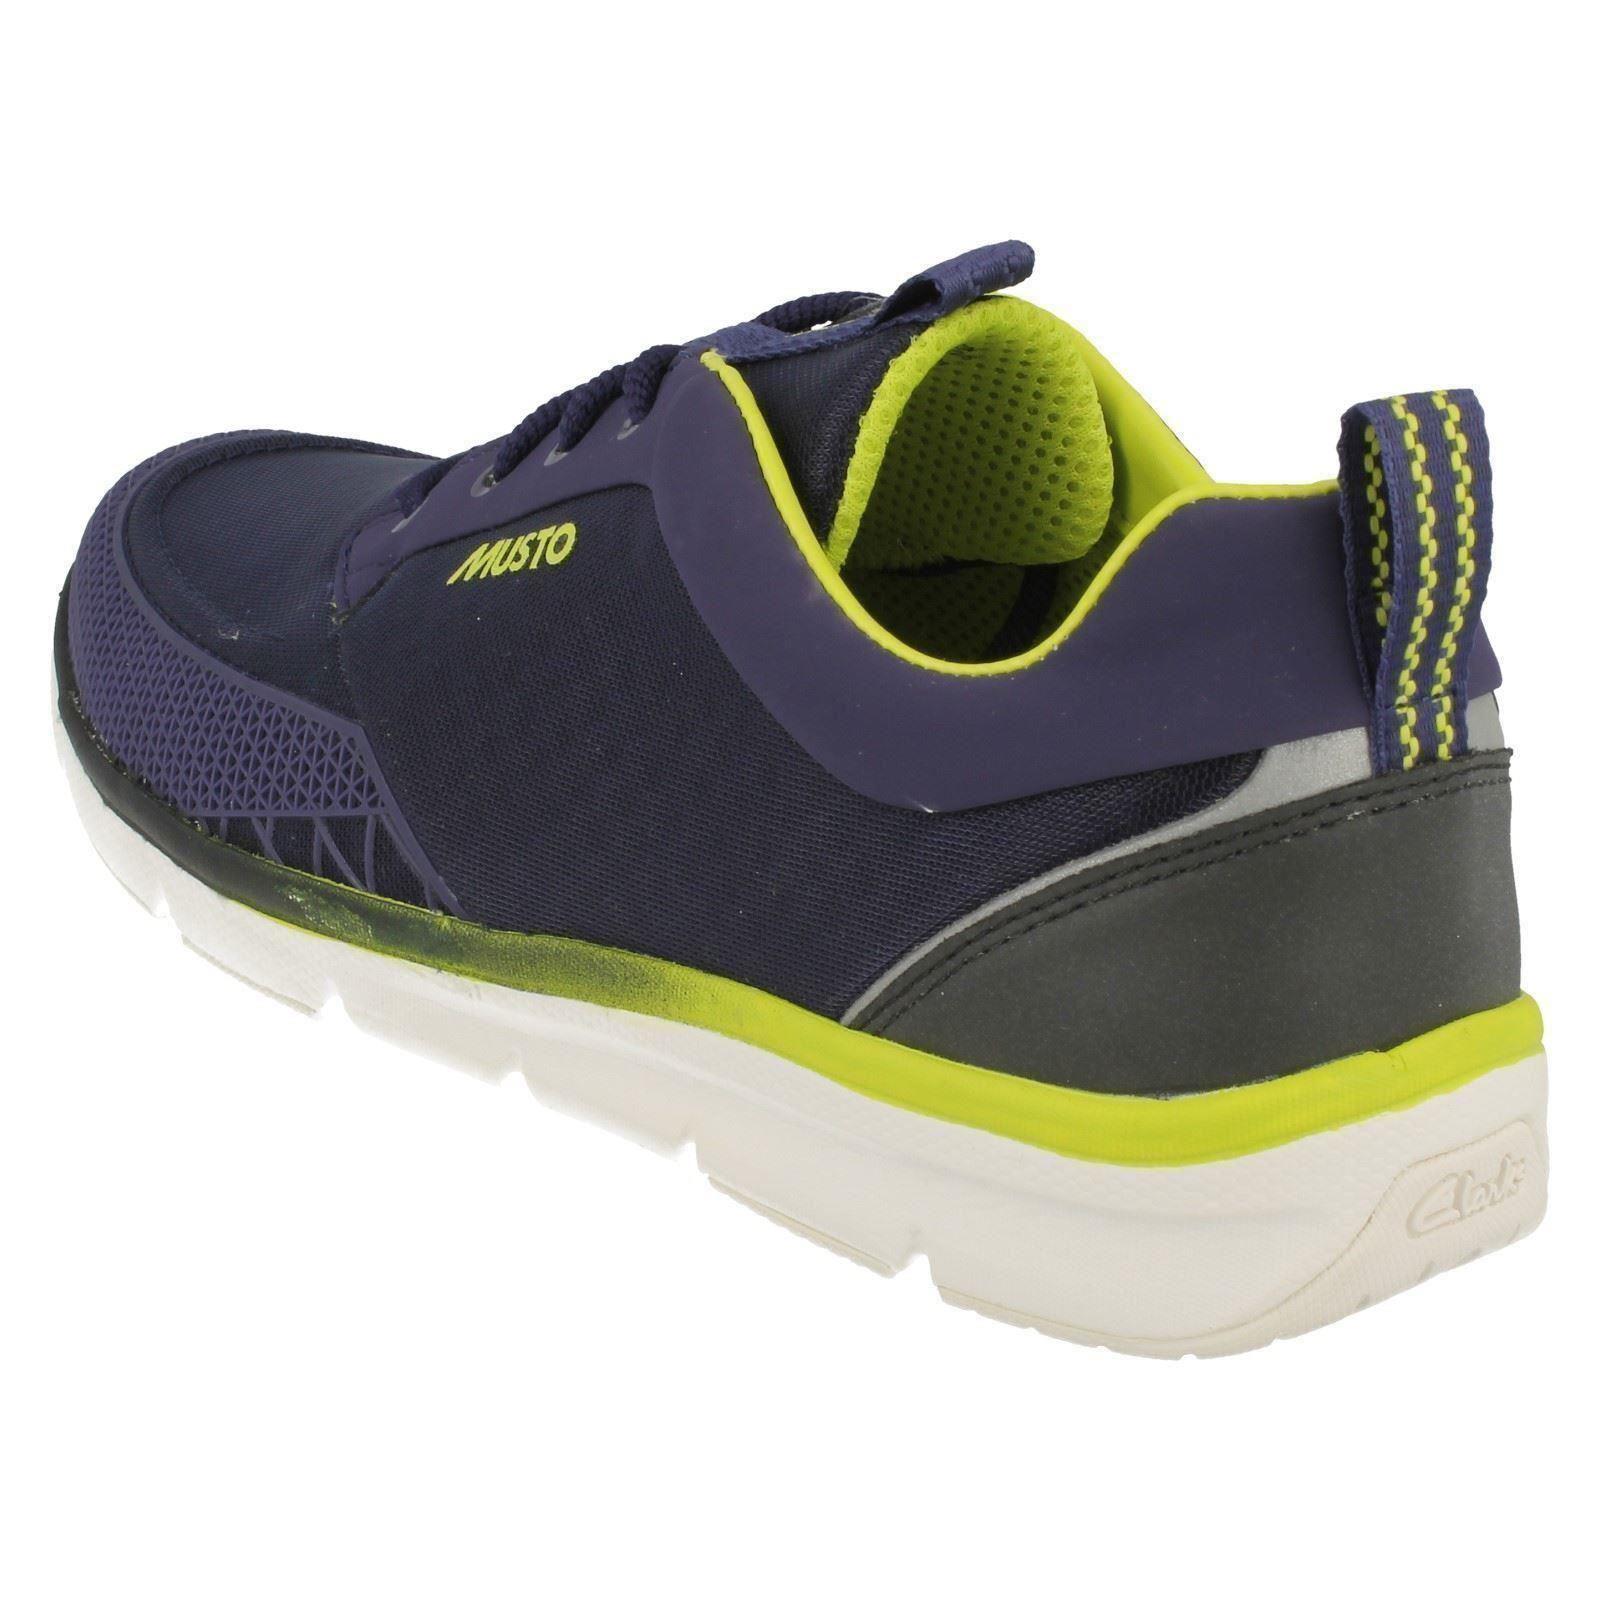 mens clarks musto sports shoes orson lite ebay